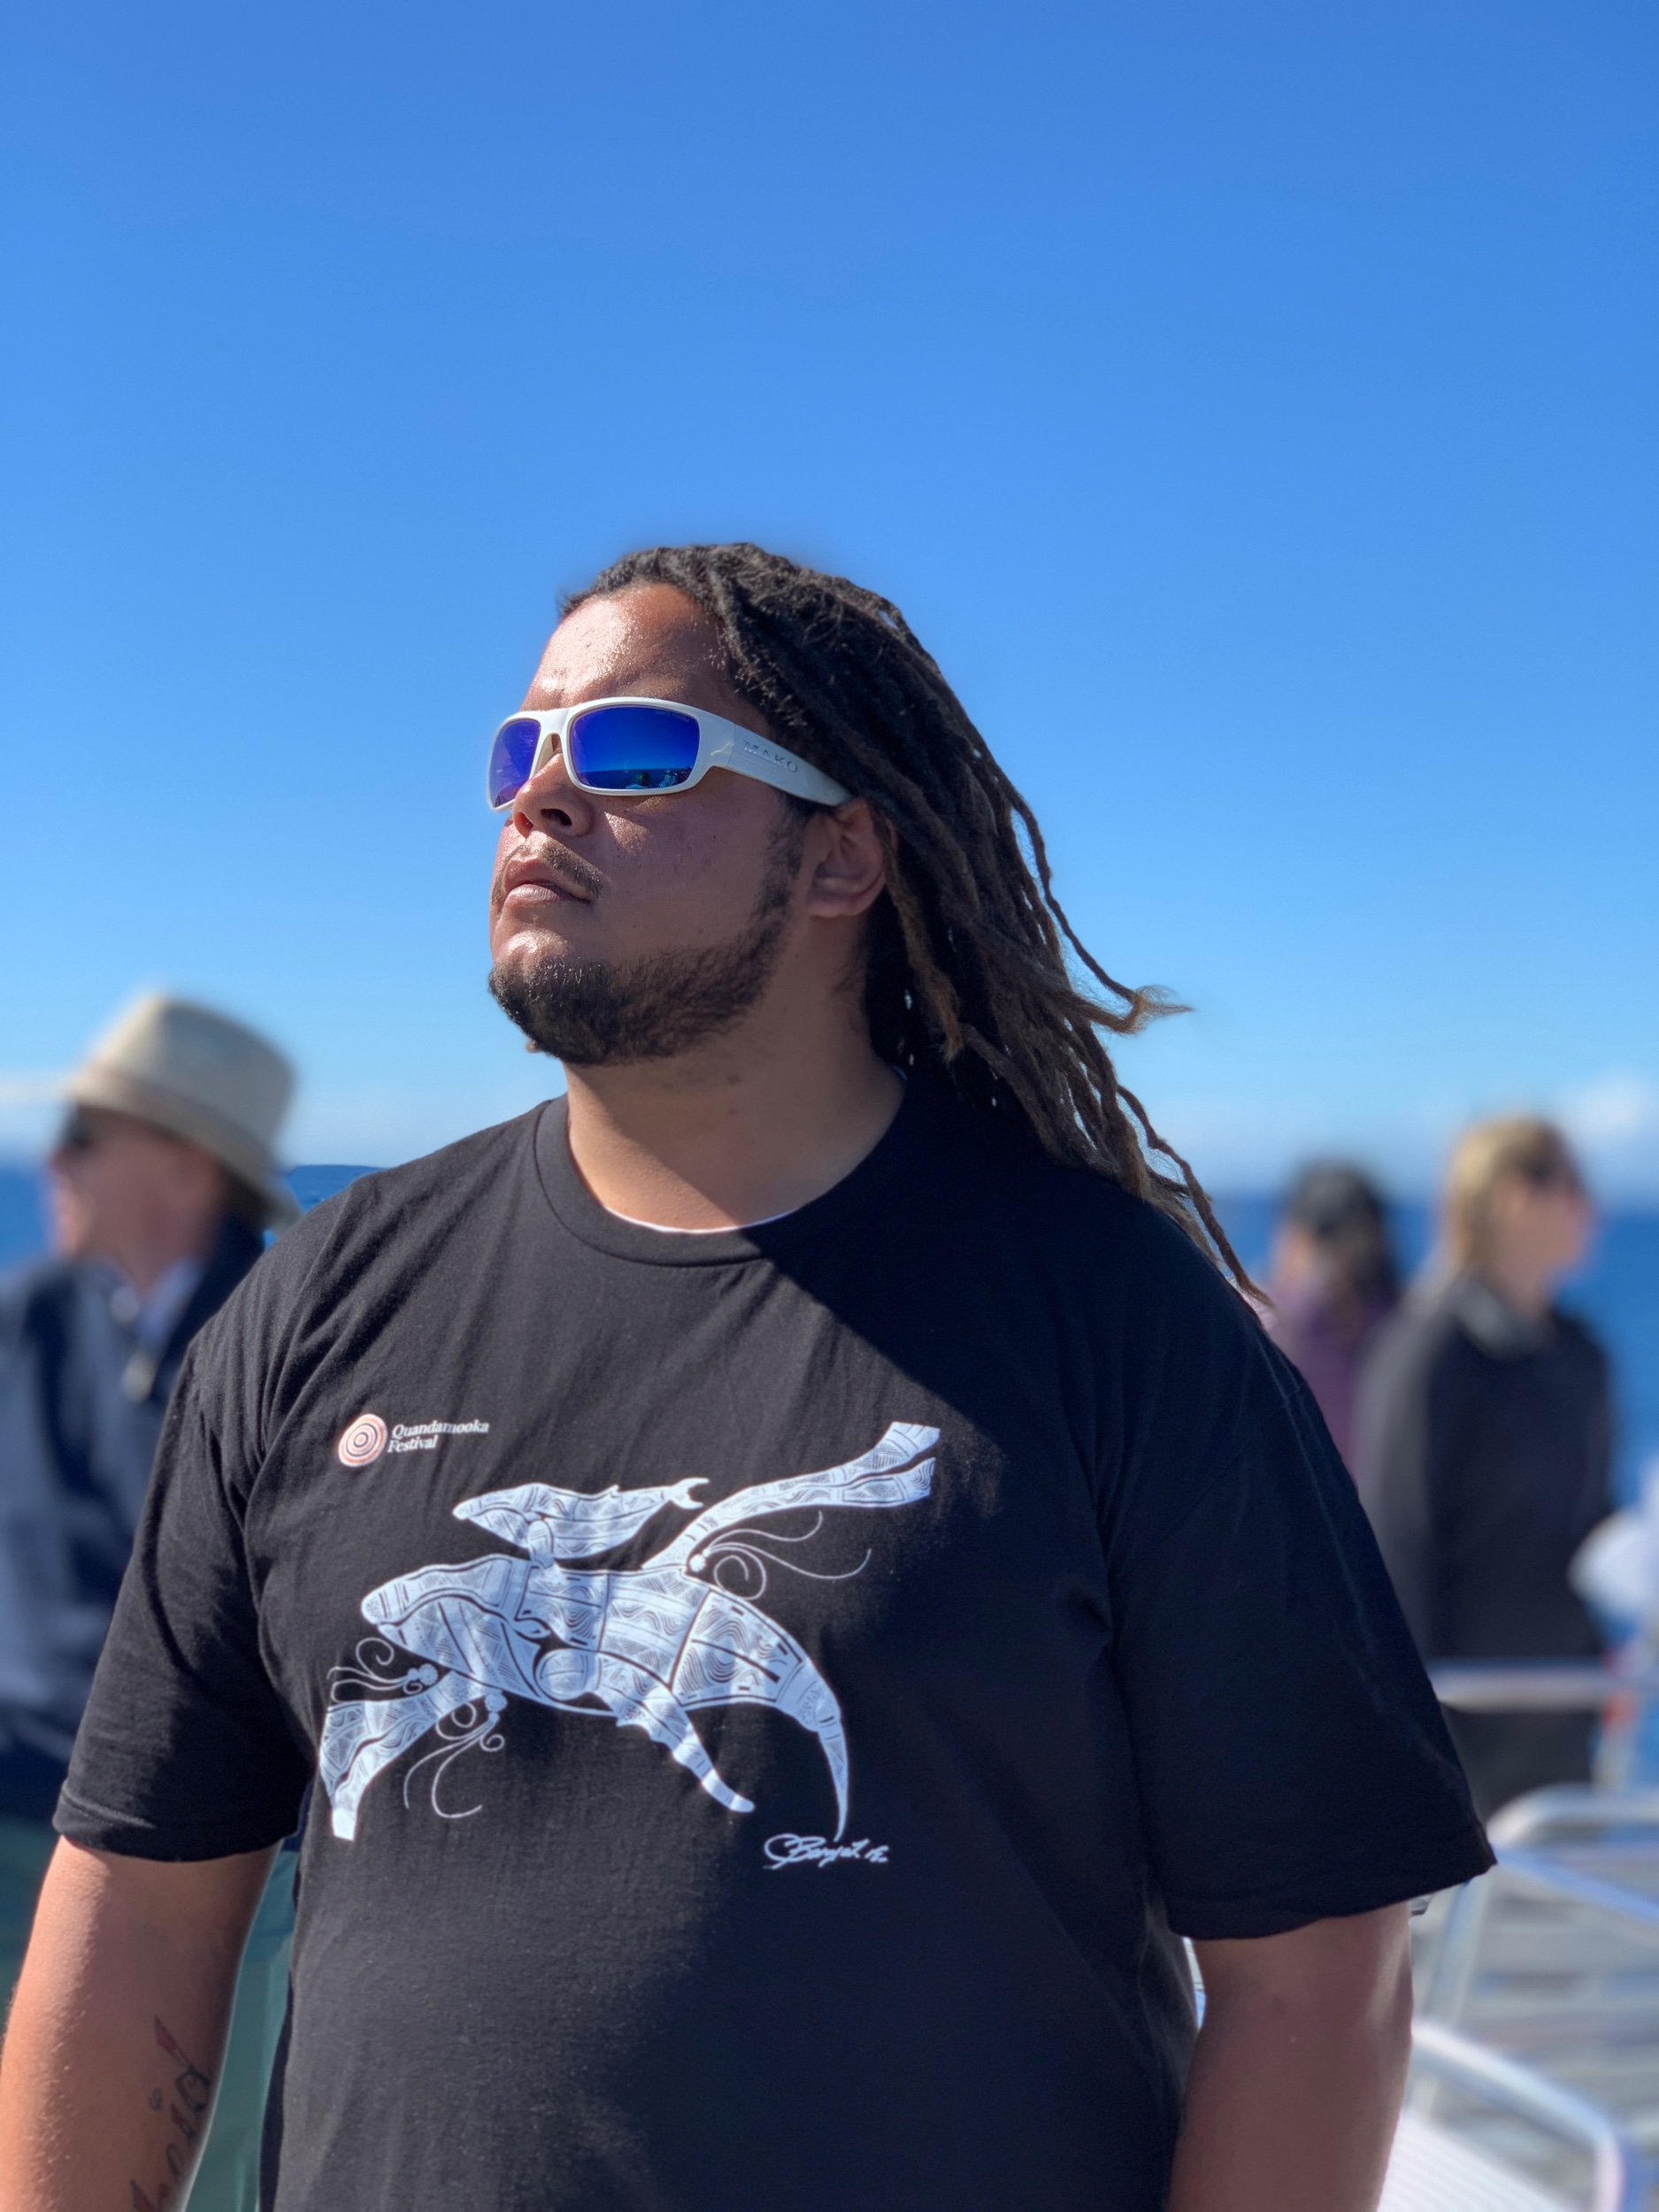 Our Aboriginal cruise guides